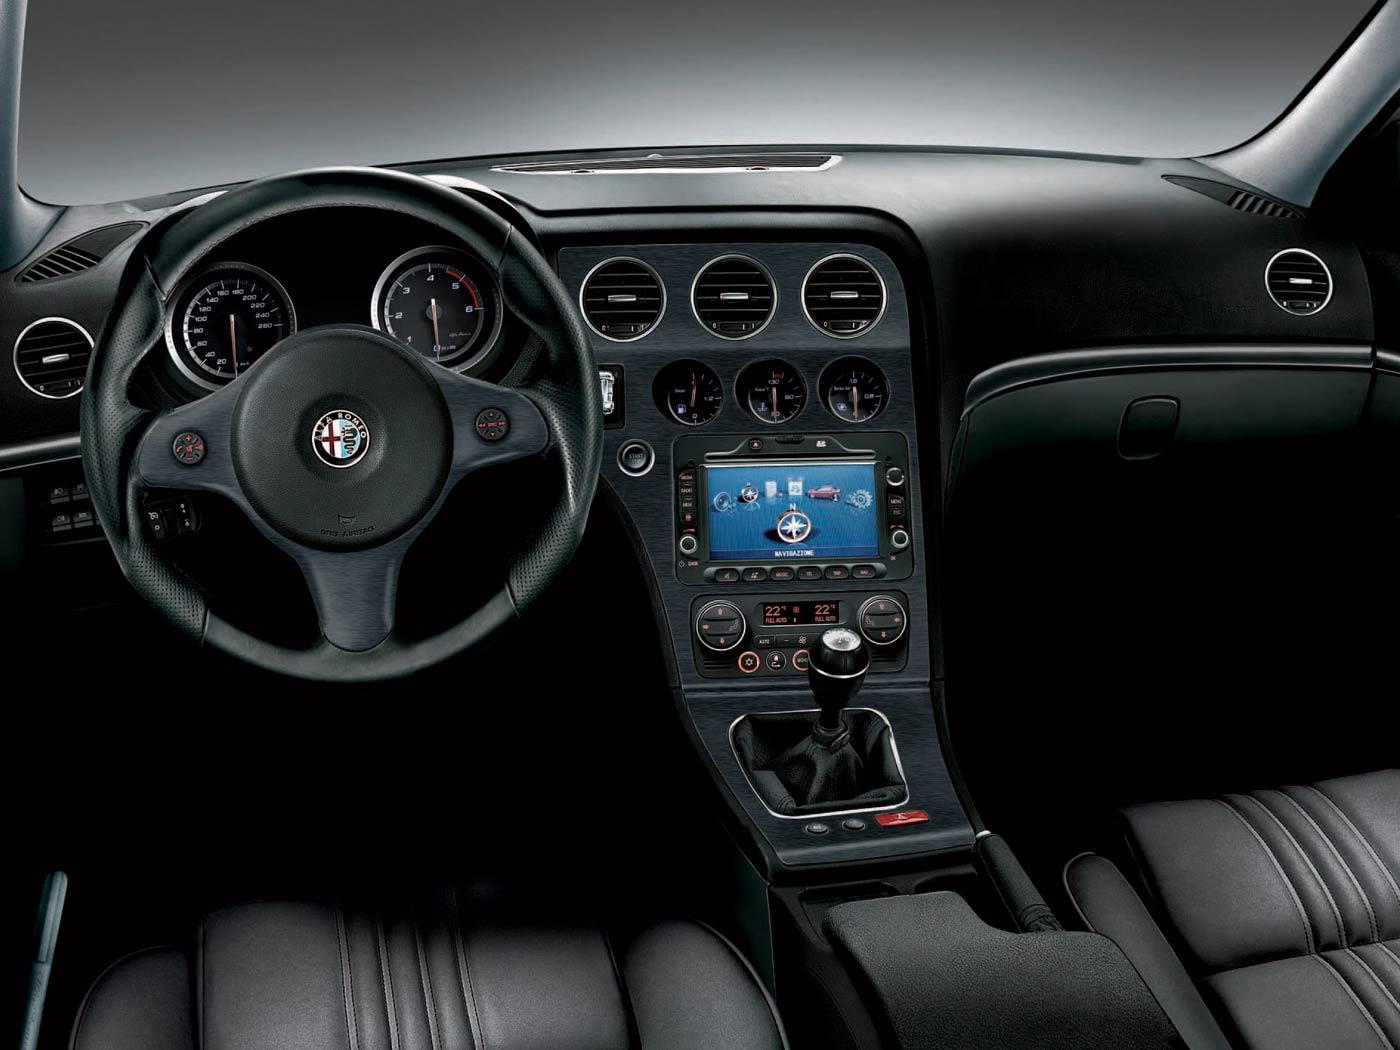 Alfa Romeo 159 14 High Quality Alfa Romeo 159 Pictures On Motorinfo Org